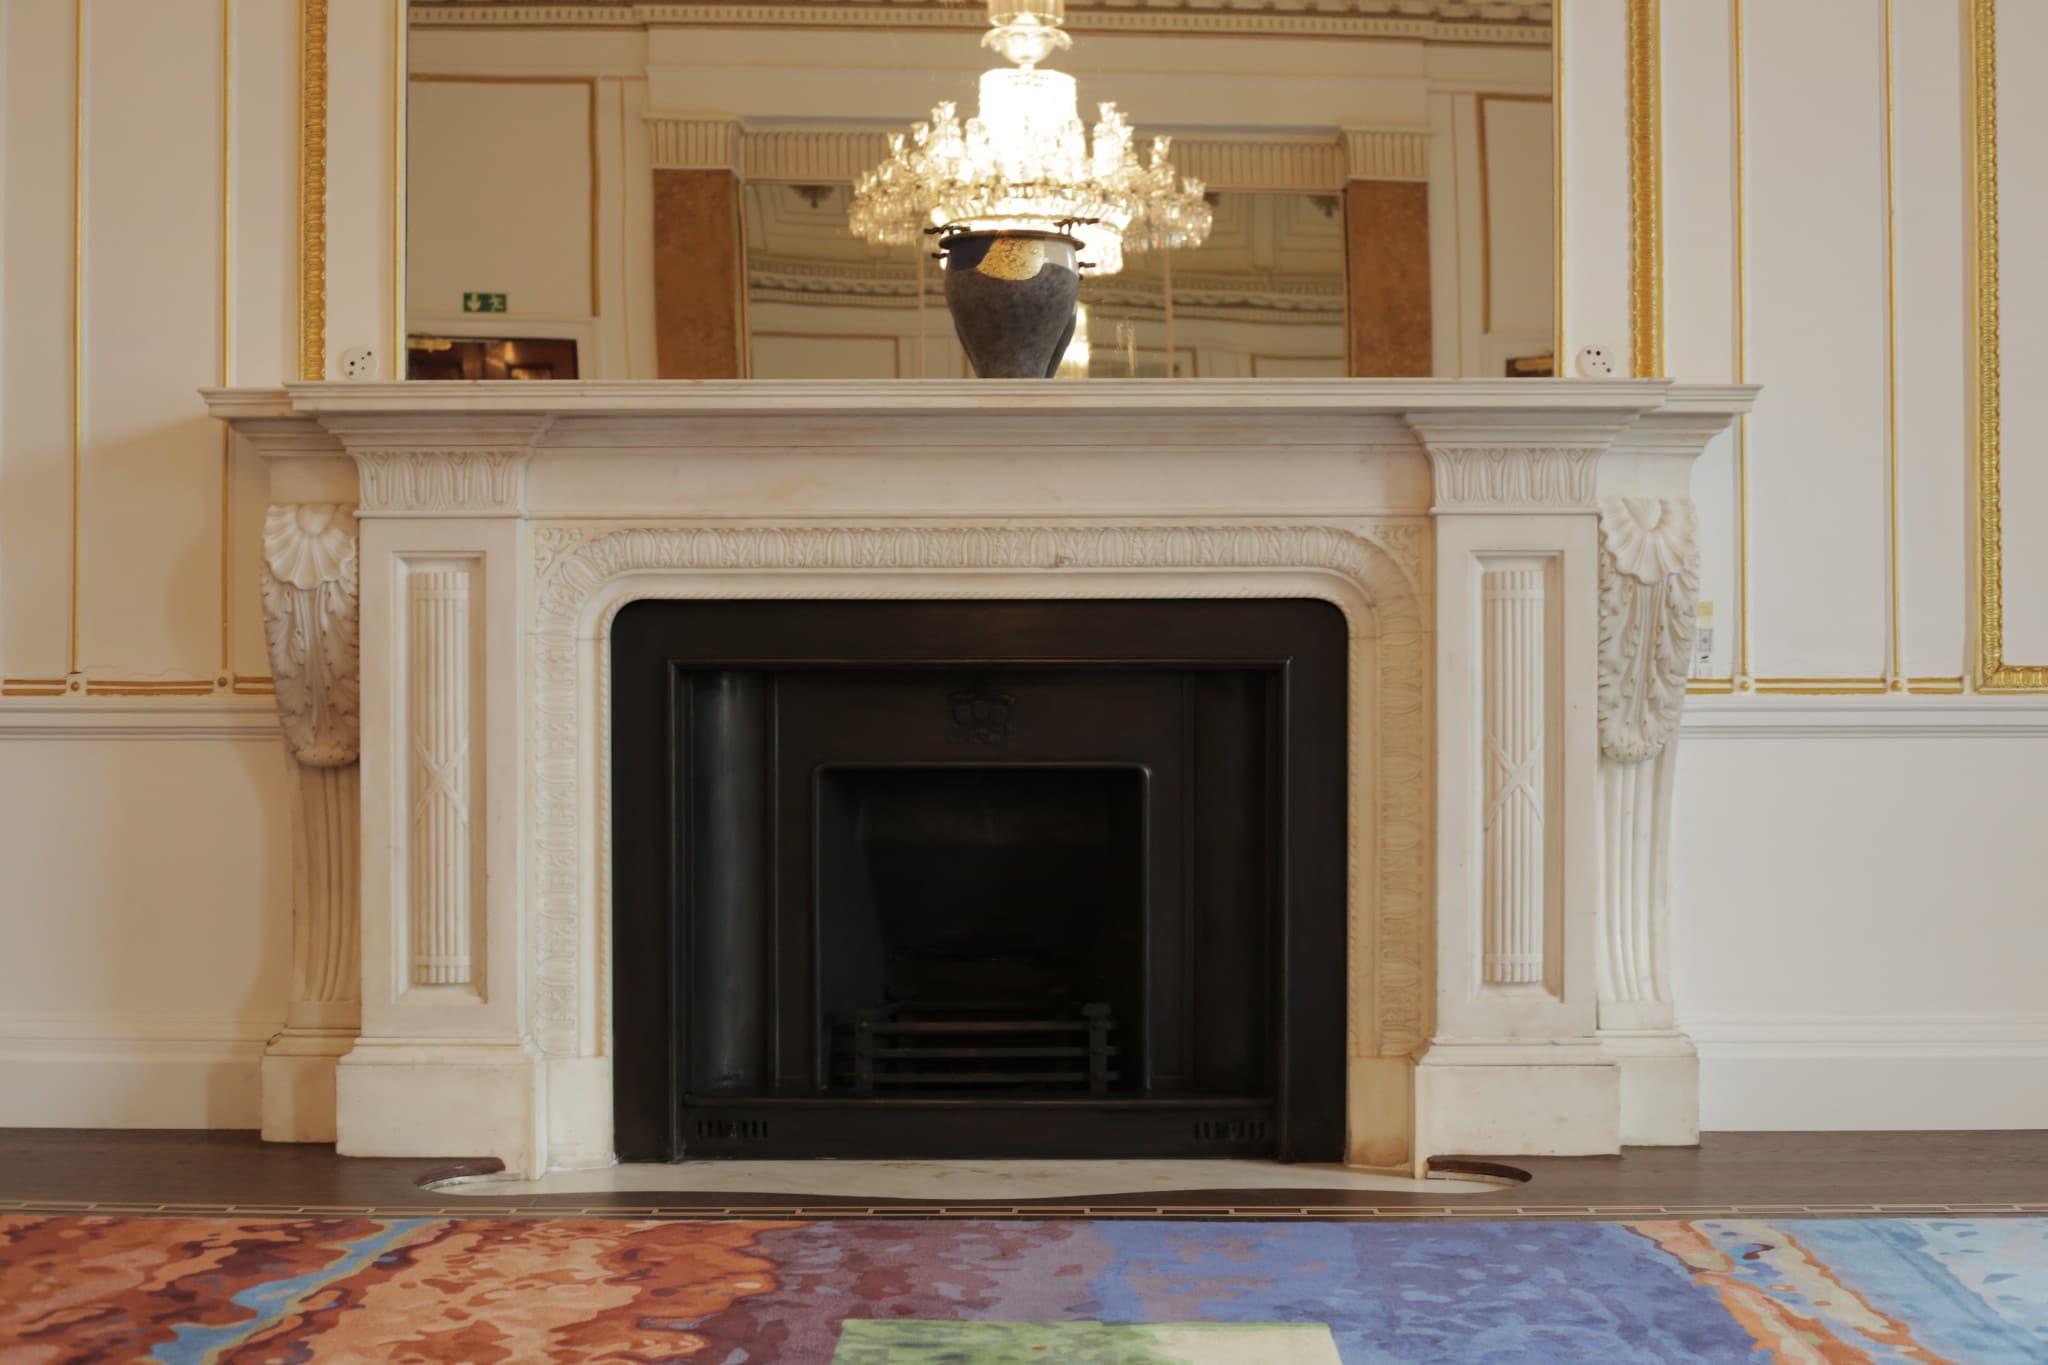 mcdonald-room-fireplace-restoration-canada-house-